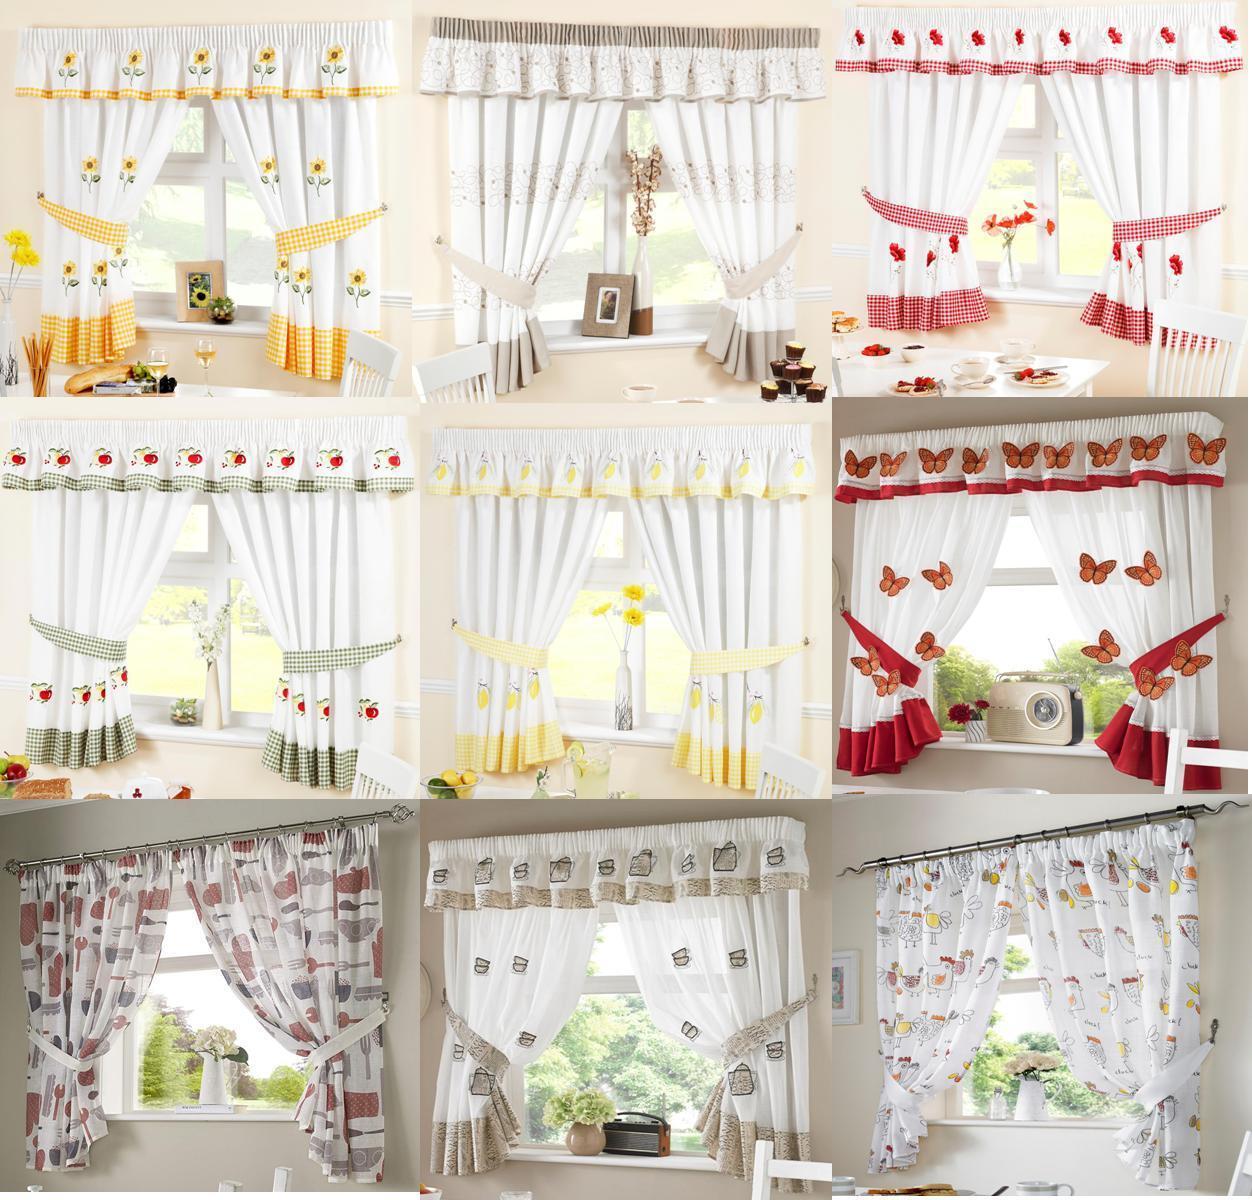 Ready Made Kitchen Window Curtains Inc Free Tiebacks Pelmets Sold Seperately Ebay